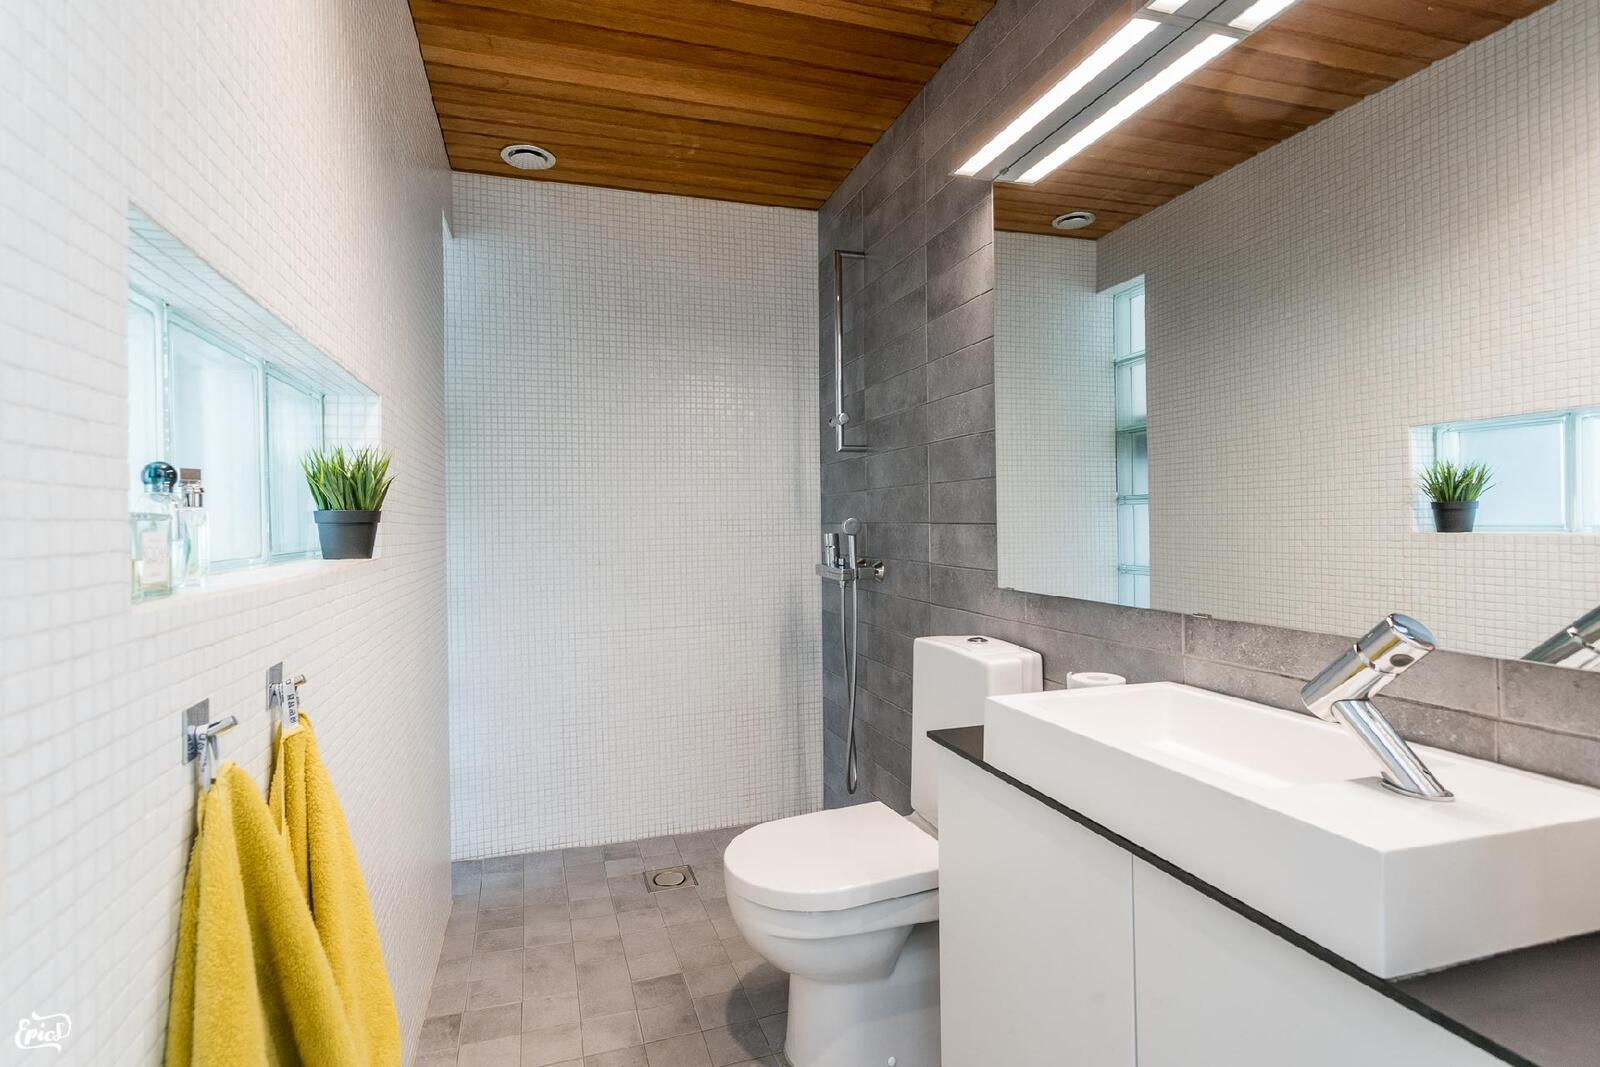 1 krs:n kylpyhuone